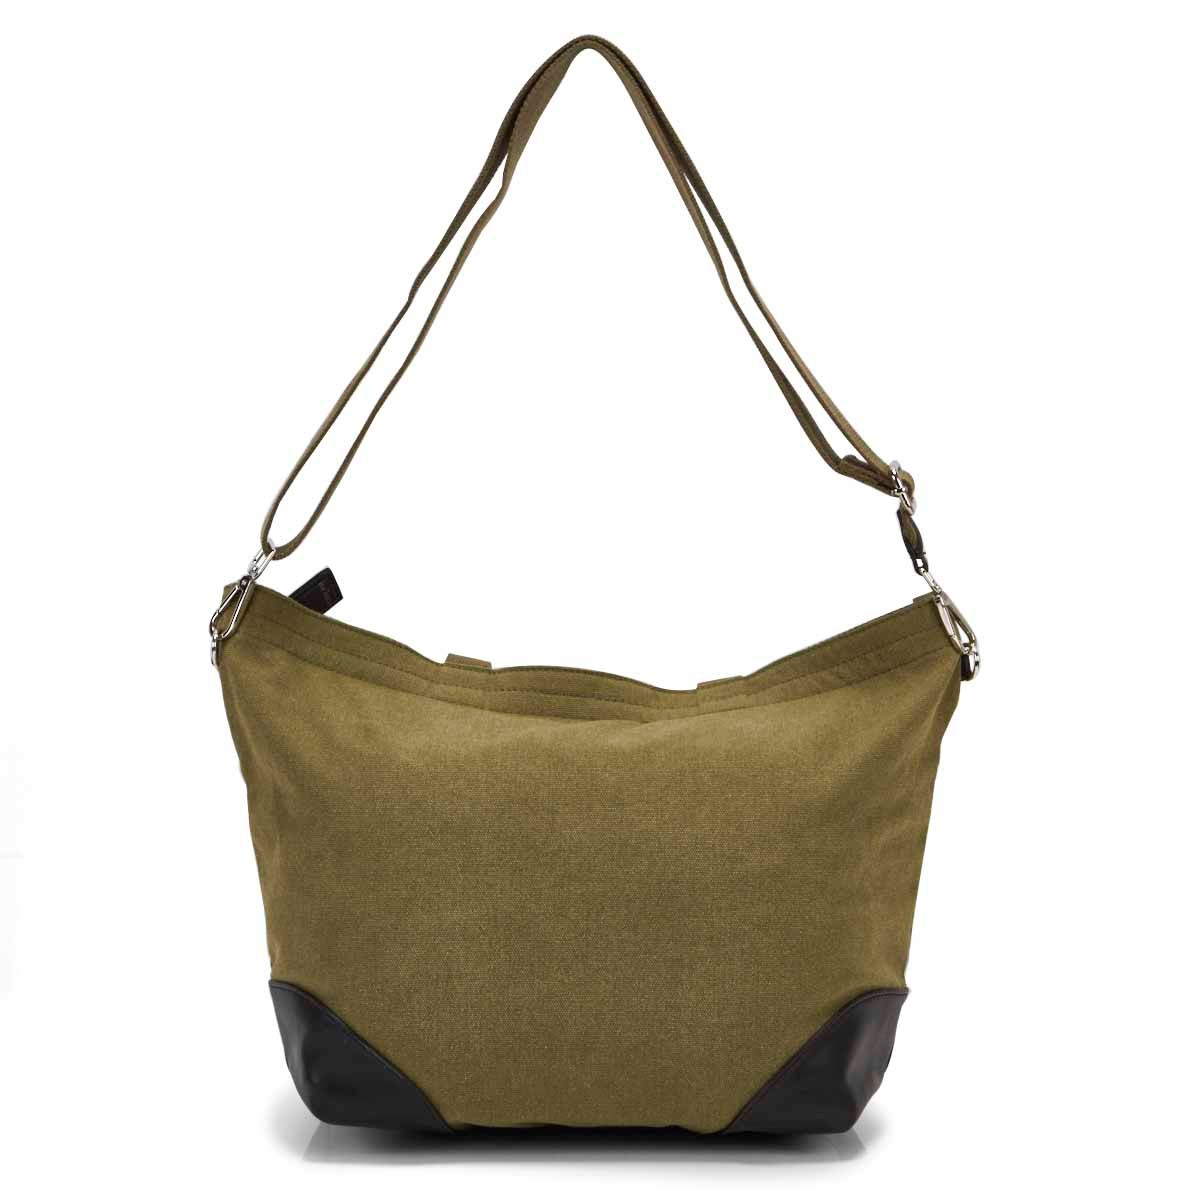 Lds khaki/black small 2 strap tote bag